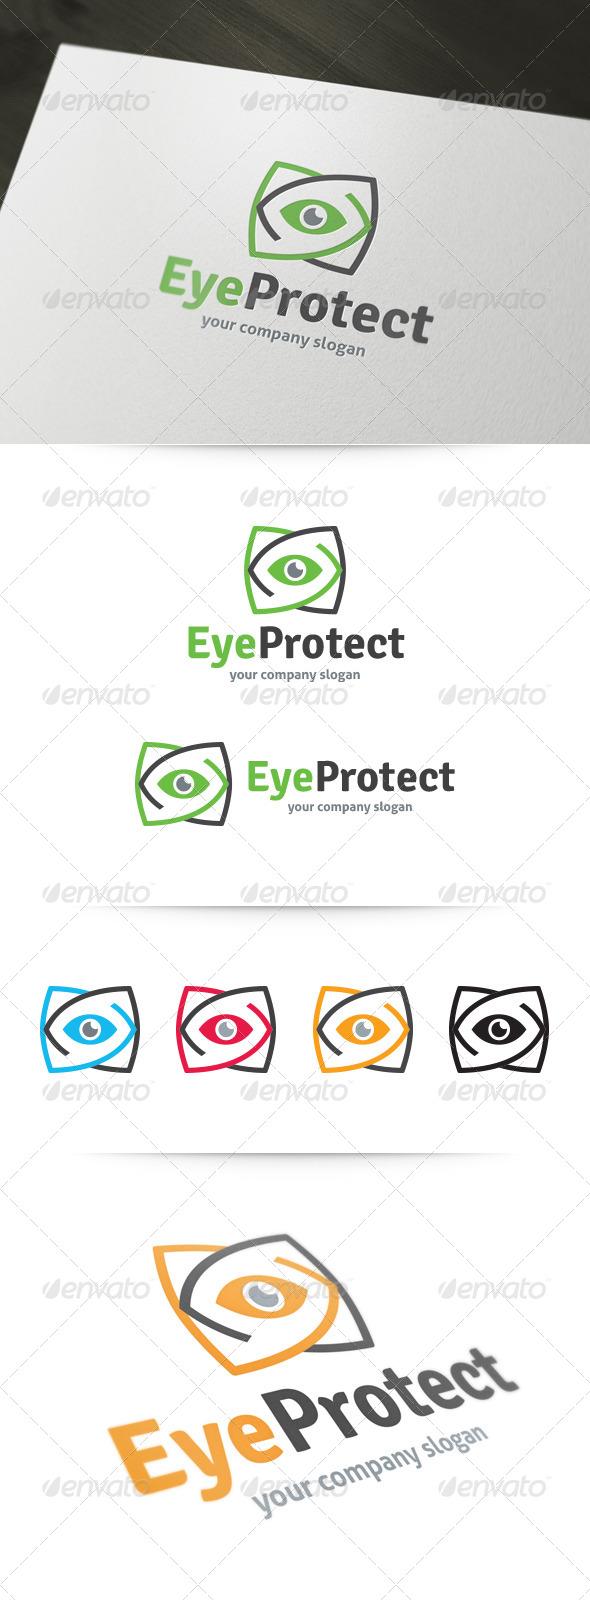 GraphicRiver Eye Protect Logo 5975176